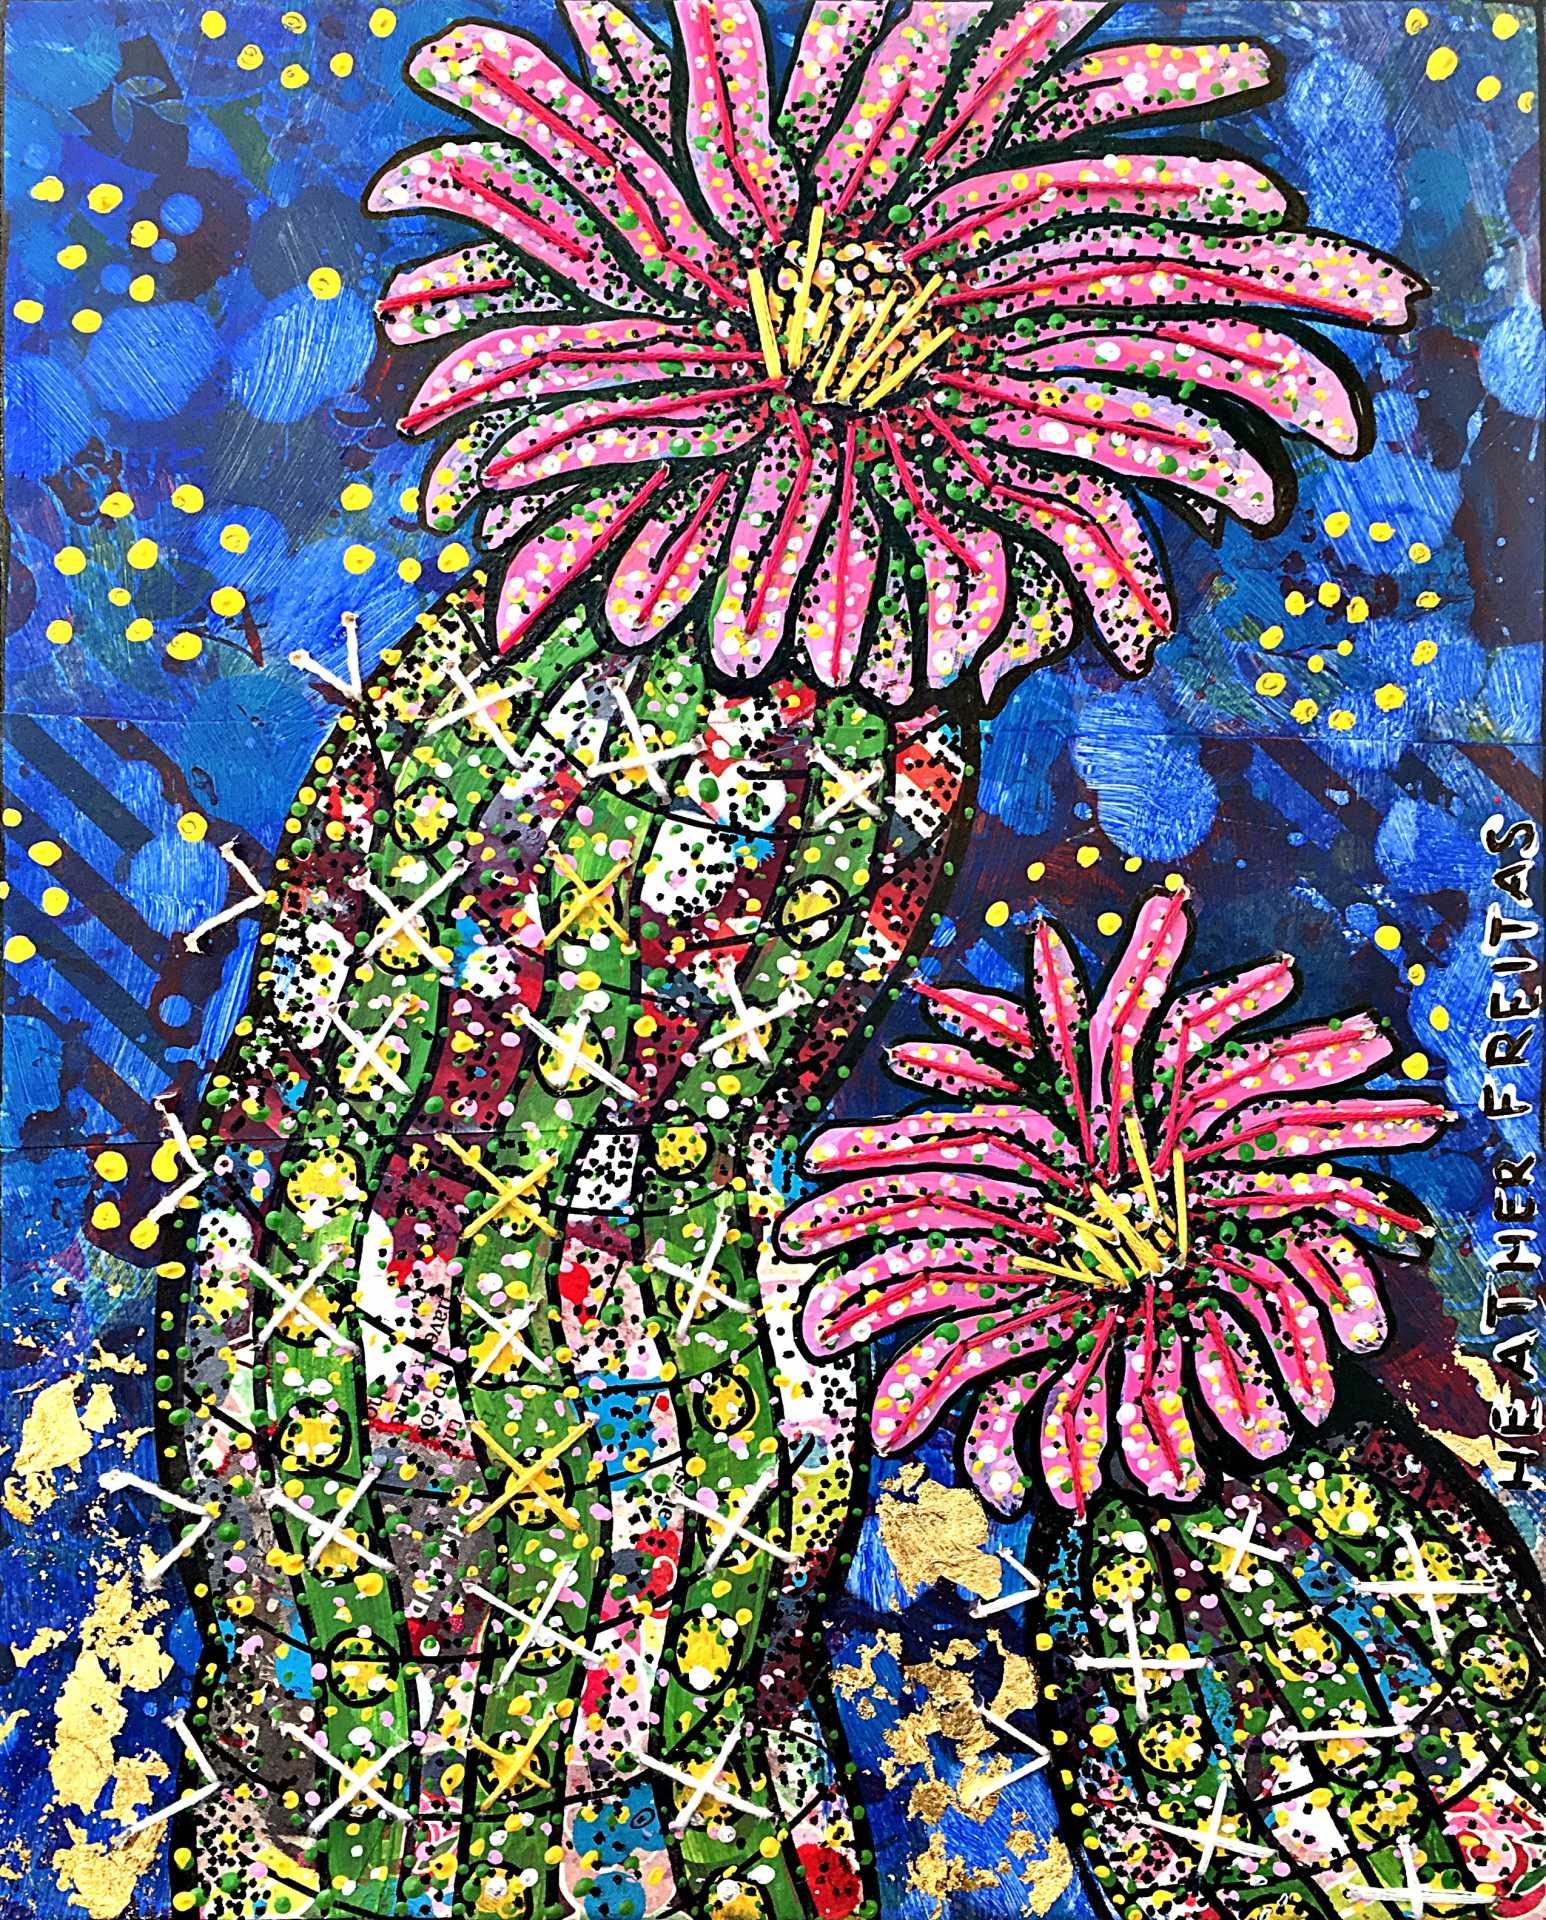 Black Lace Cactus